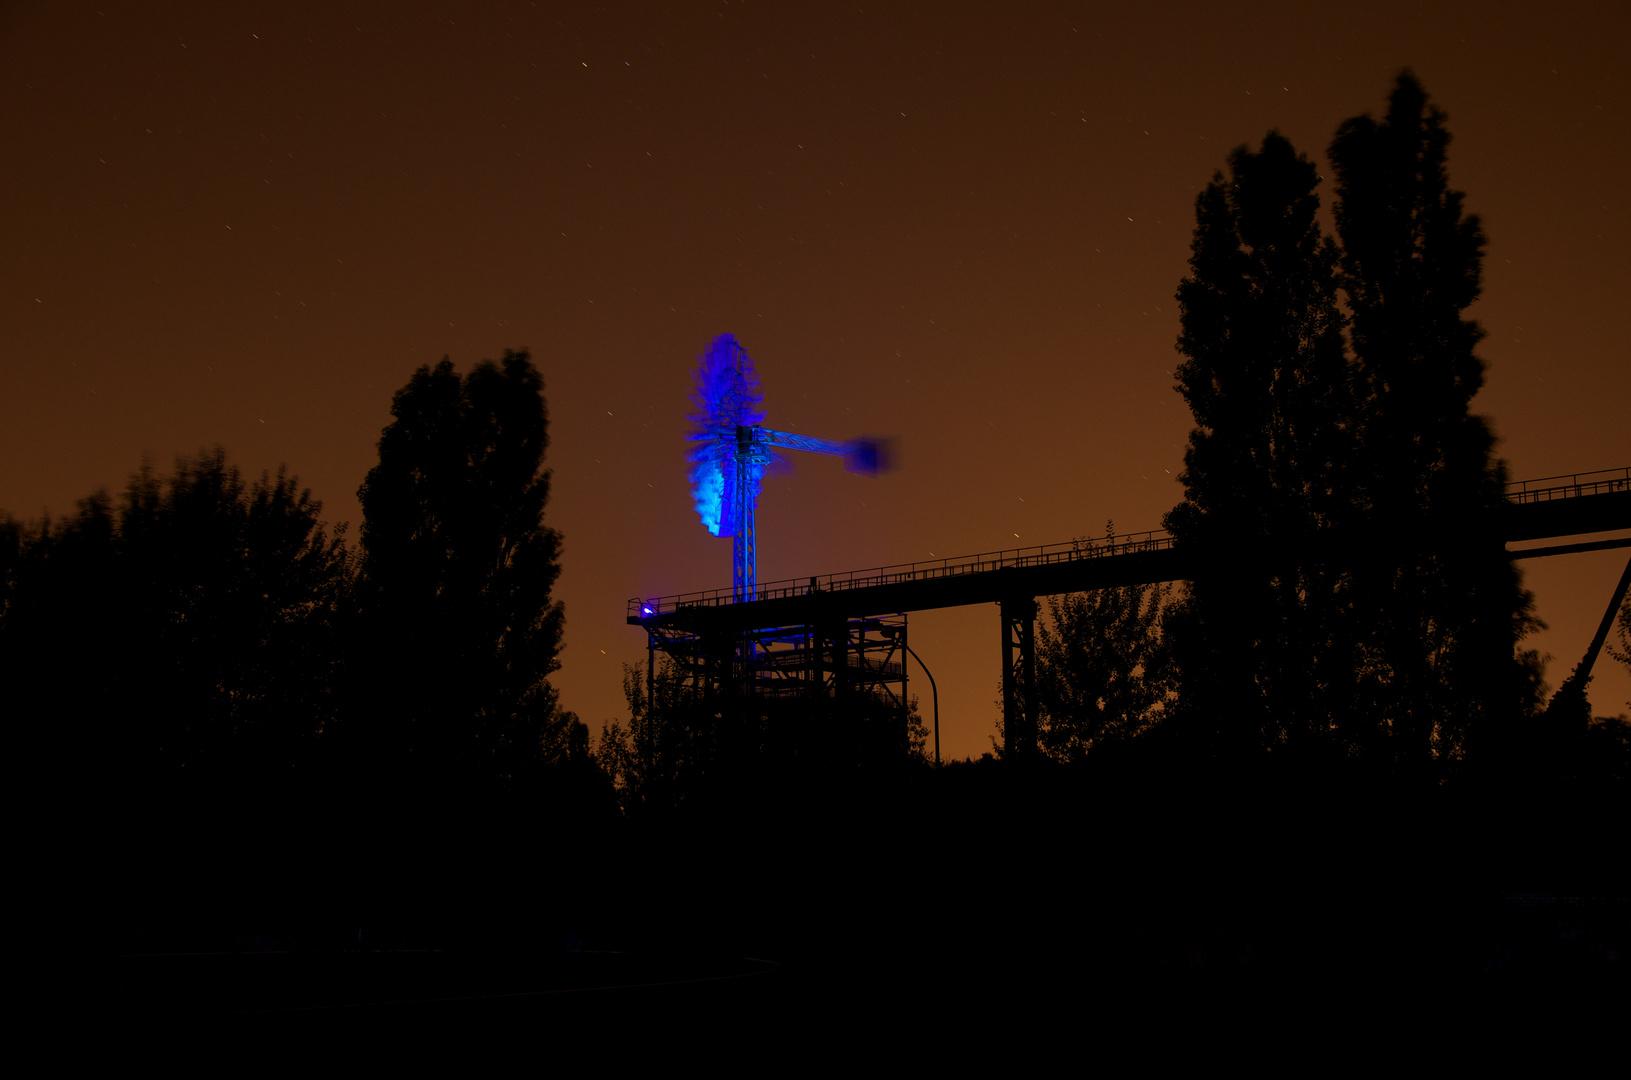 Windrad bei Nacht